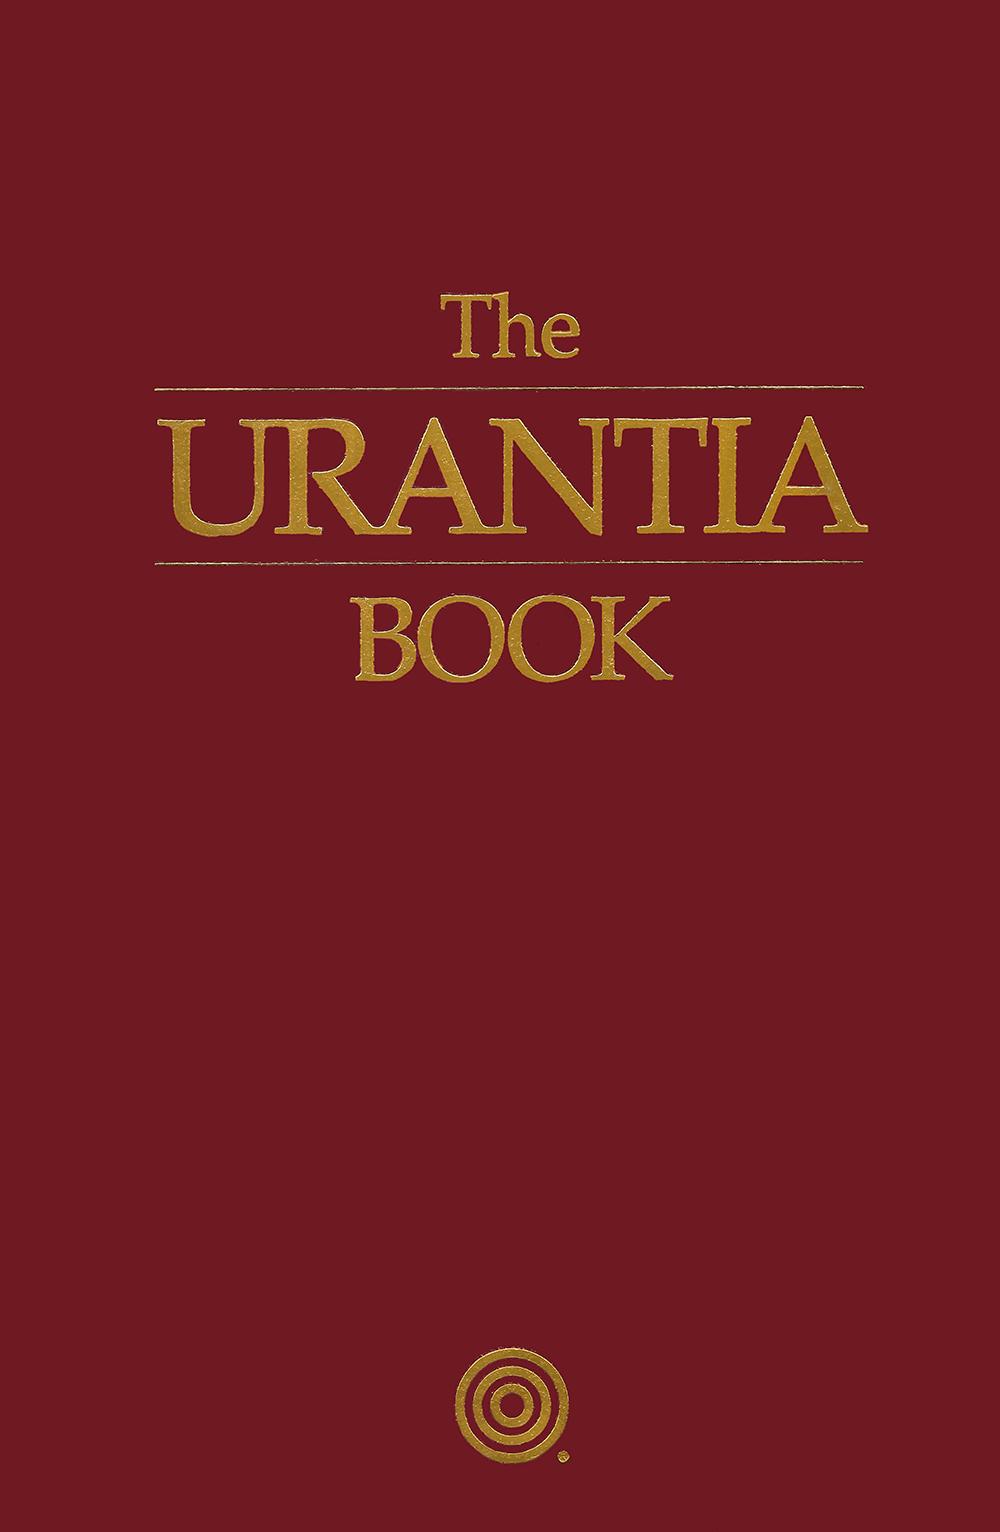 1999 The Urantia Book - Leather - Burgundy